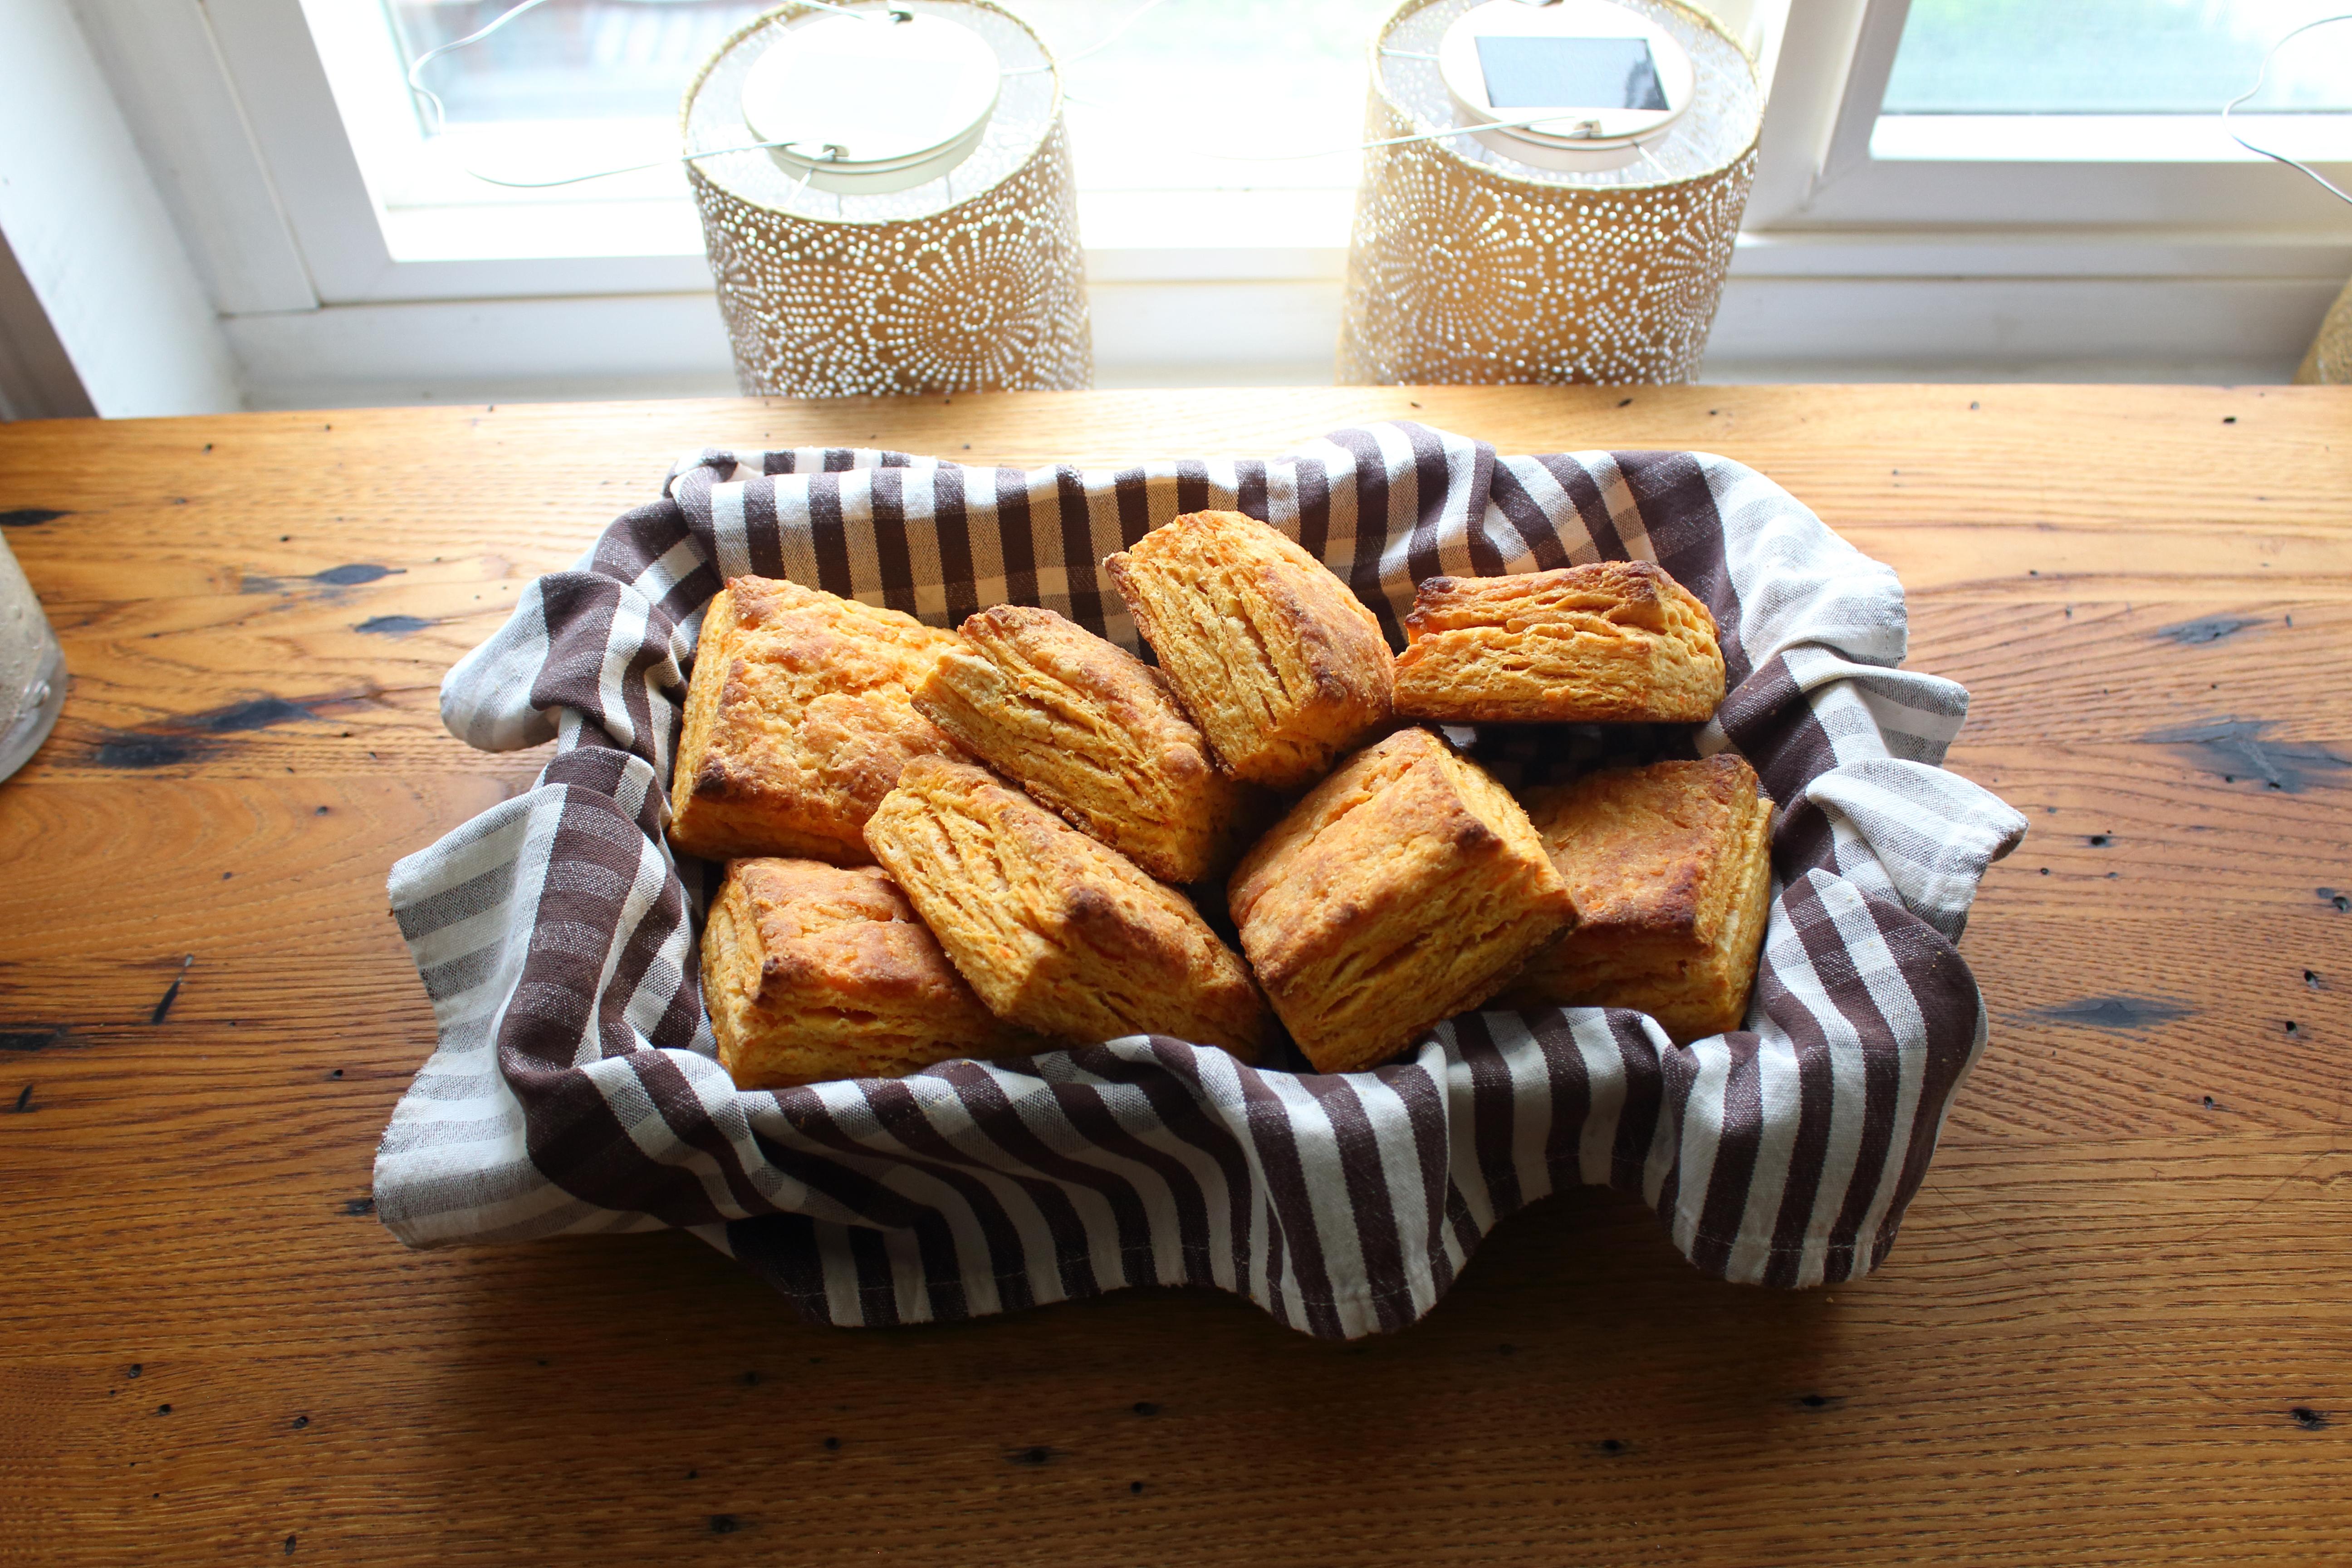 Chef John's Sweet Potato Biscuits